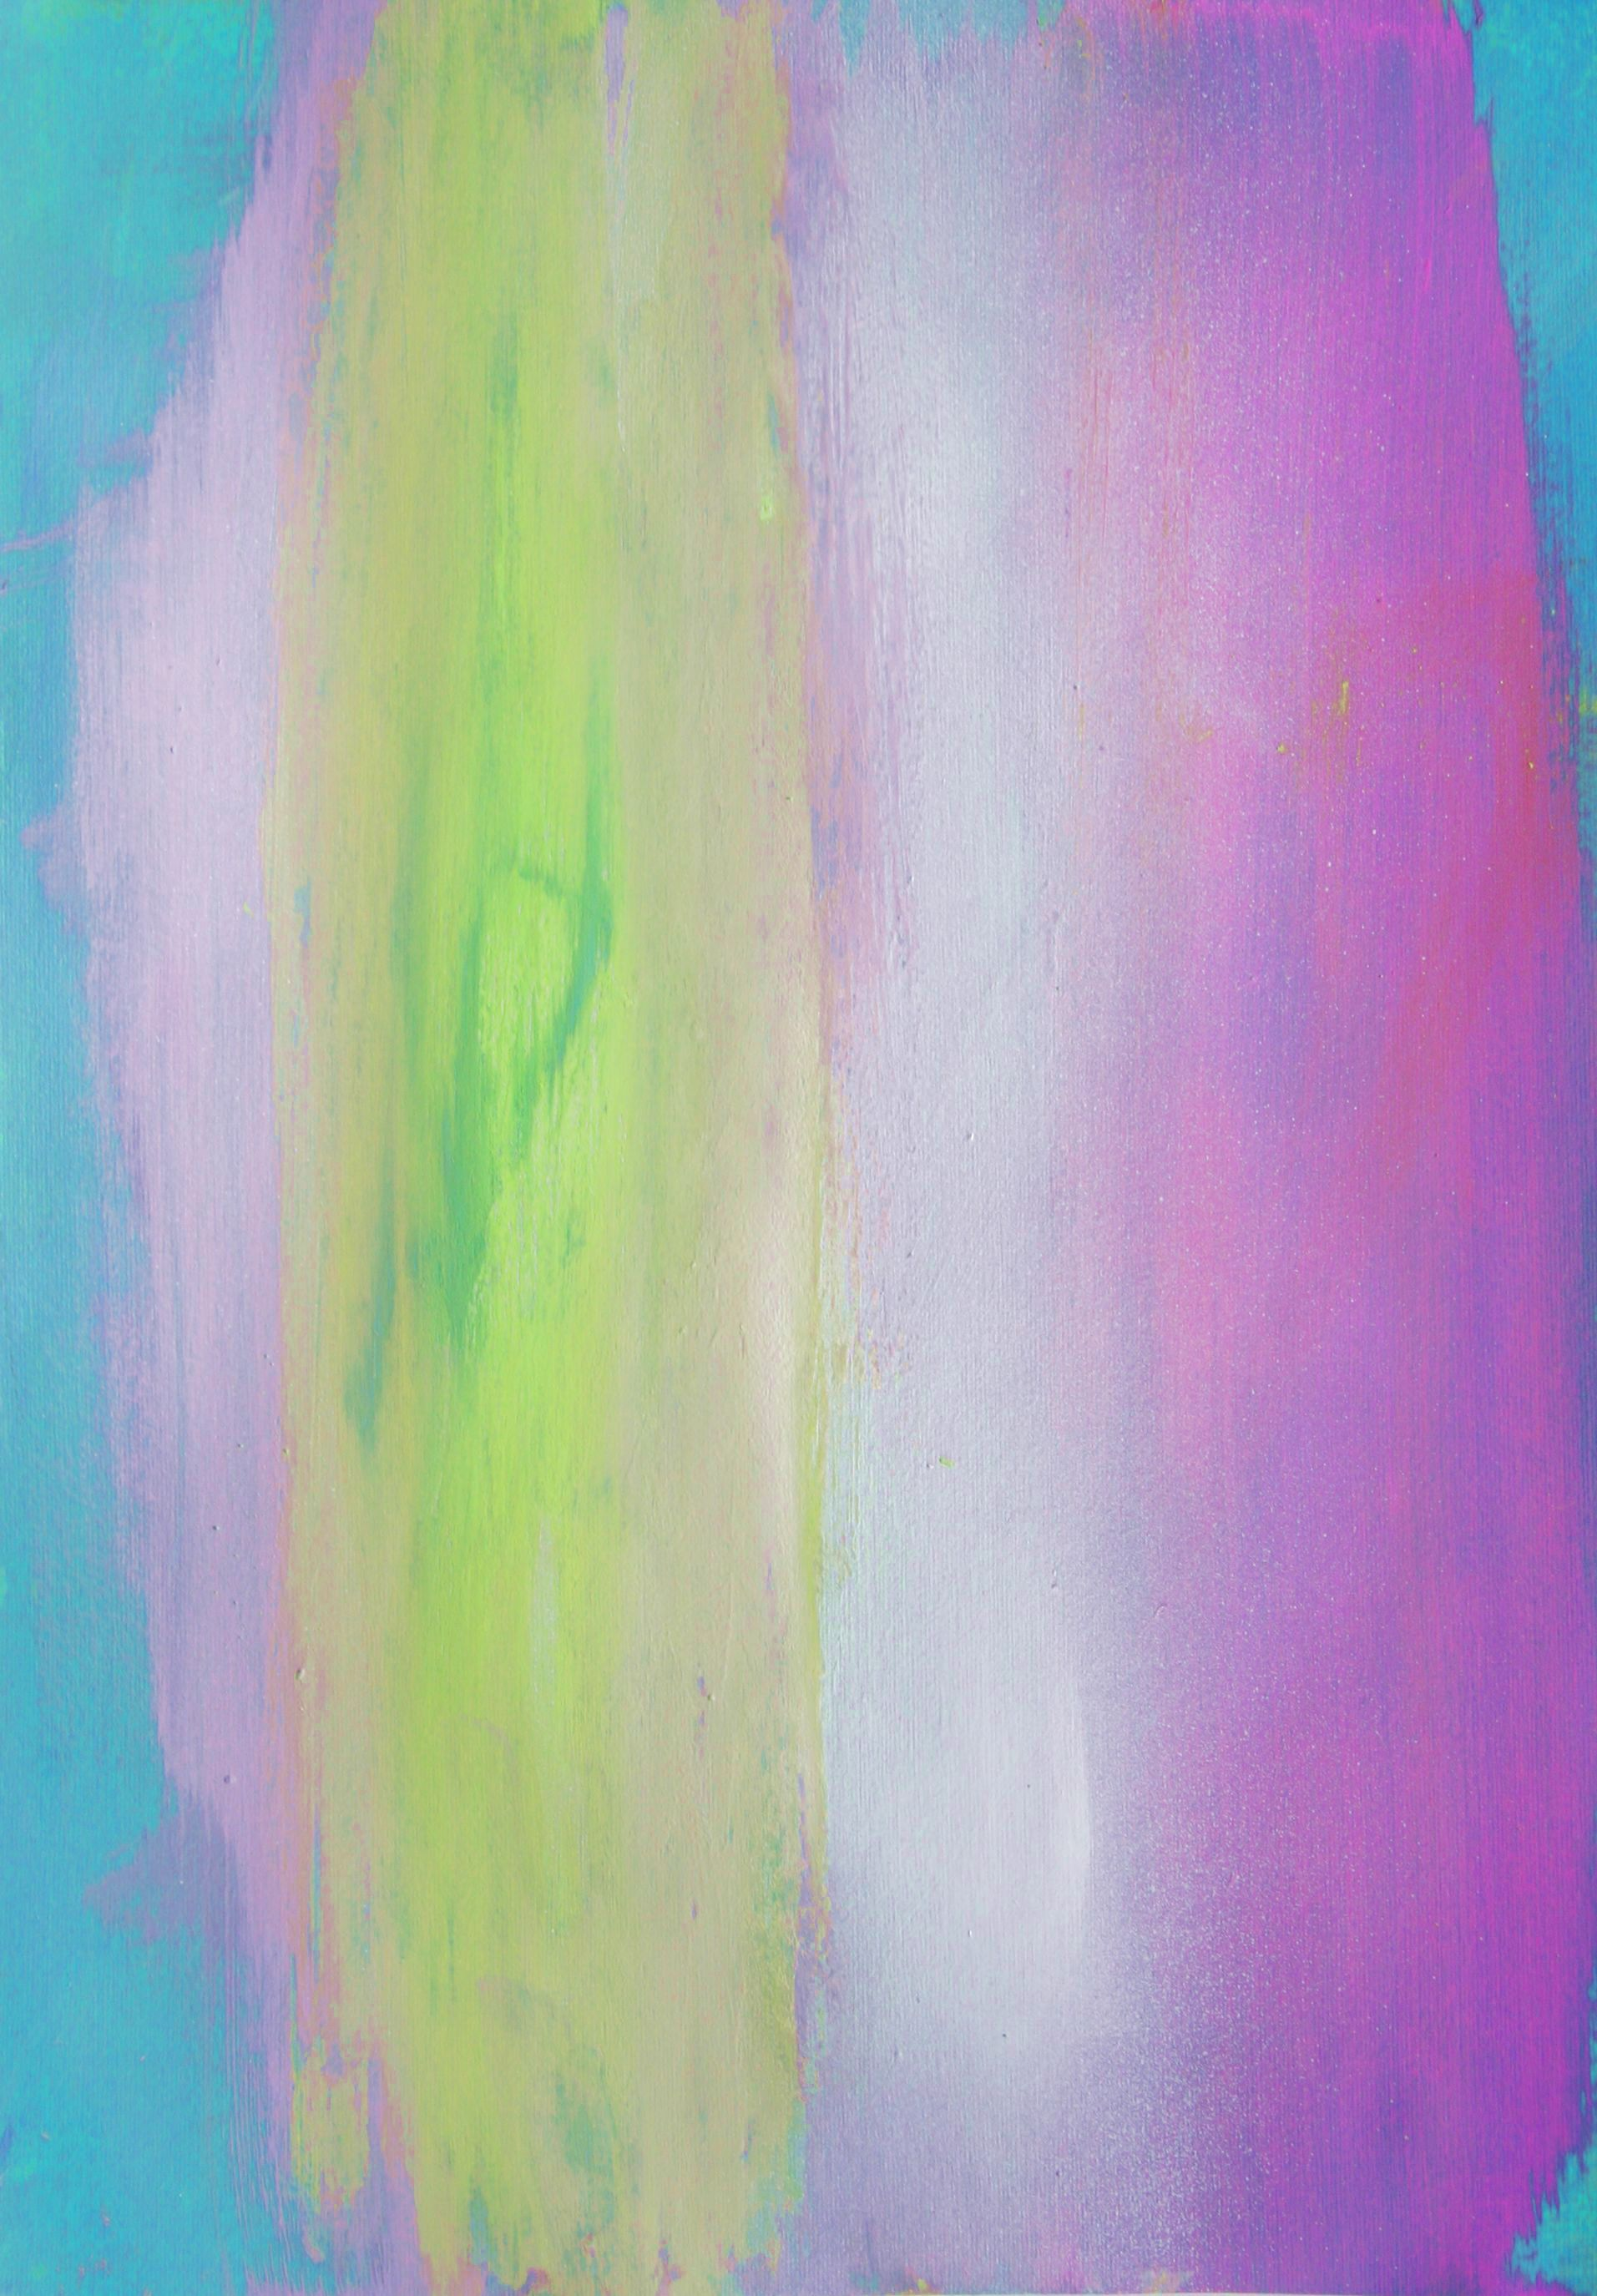 """Inner Balance"" project"